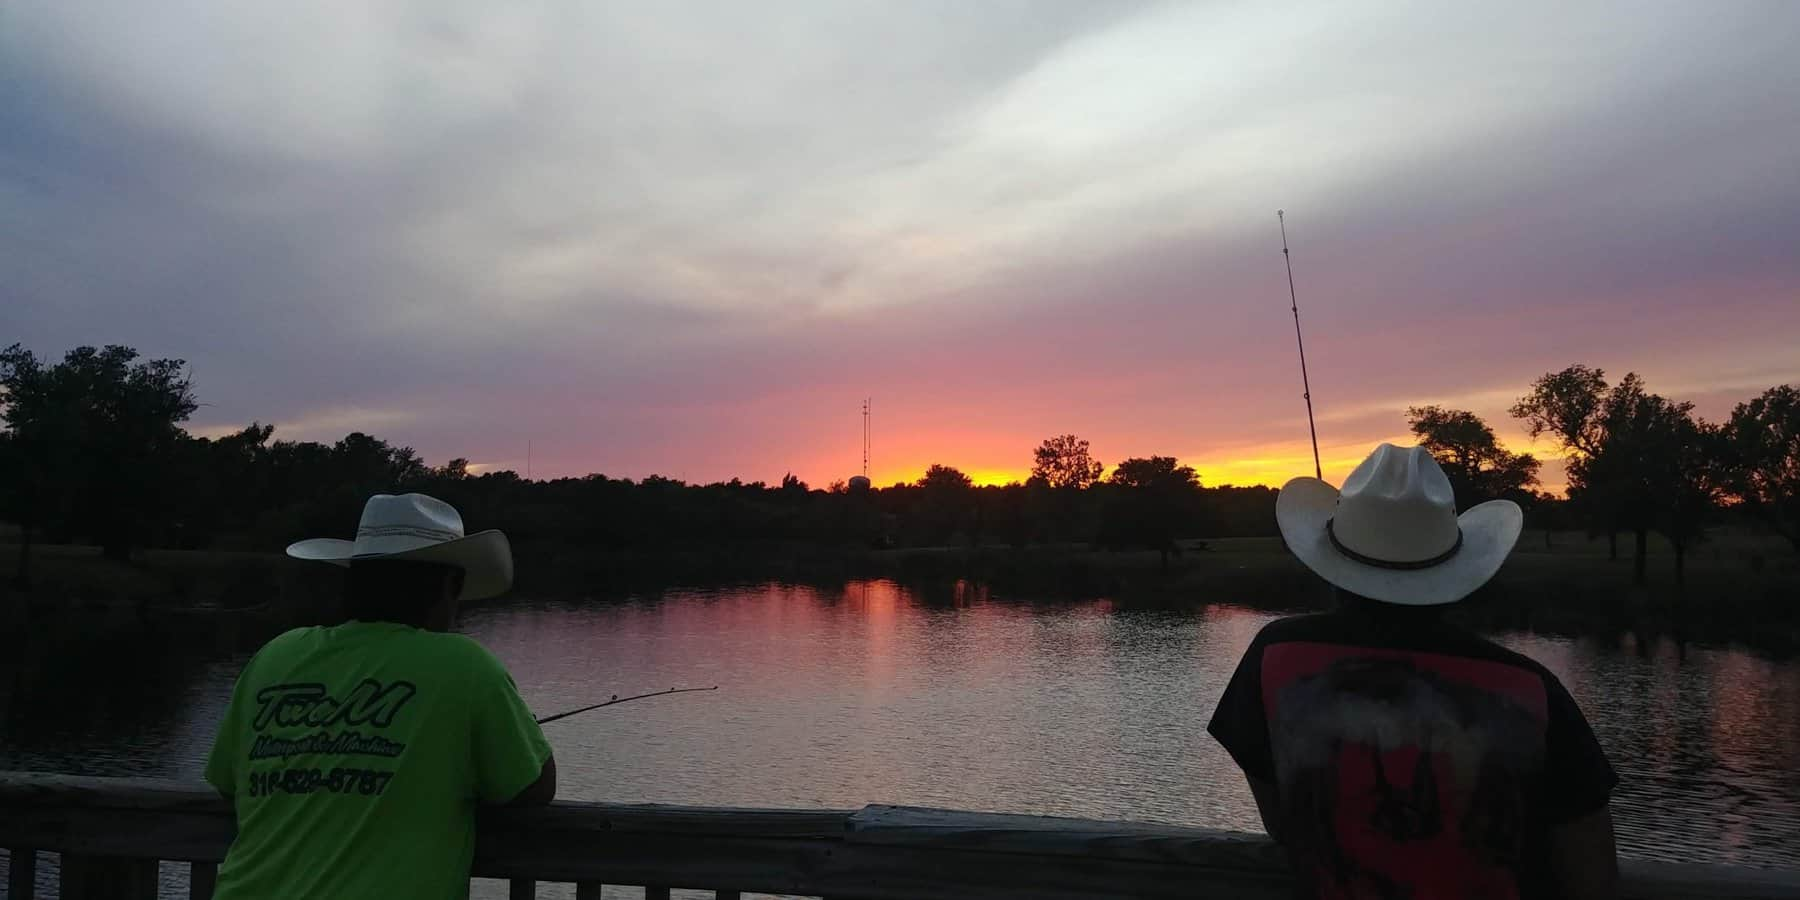 sunset over texas fisherman